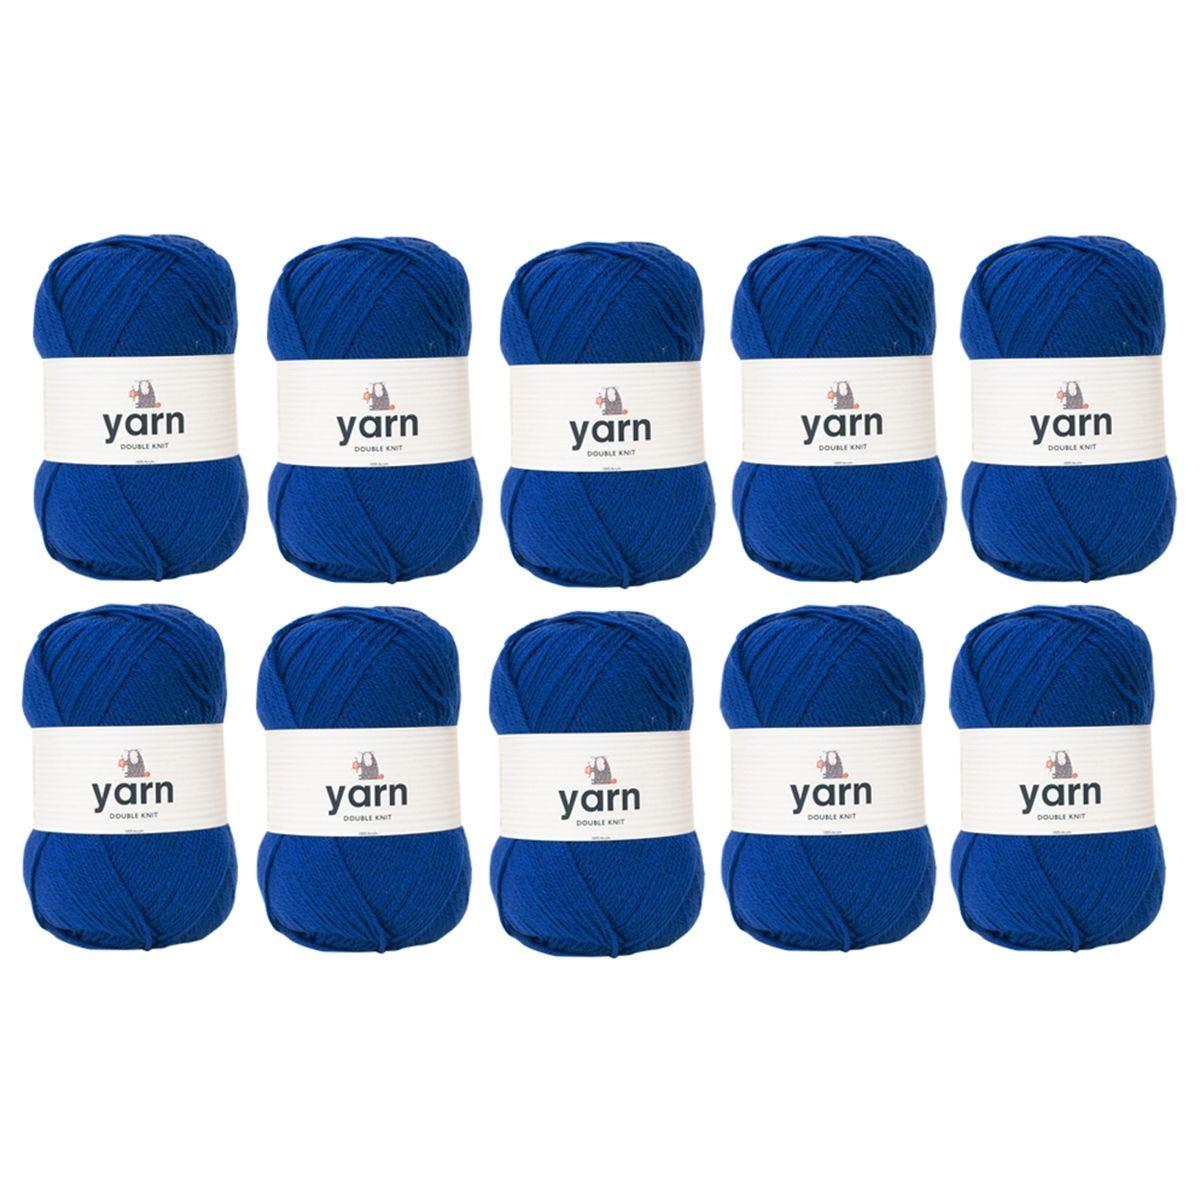 Korbond Royal Blue Double Knit Yarn Bulk Pack Bundle - 10 x 100g